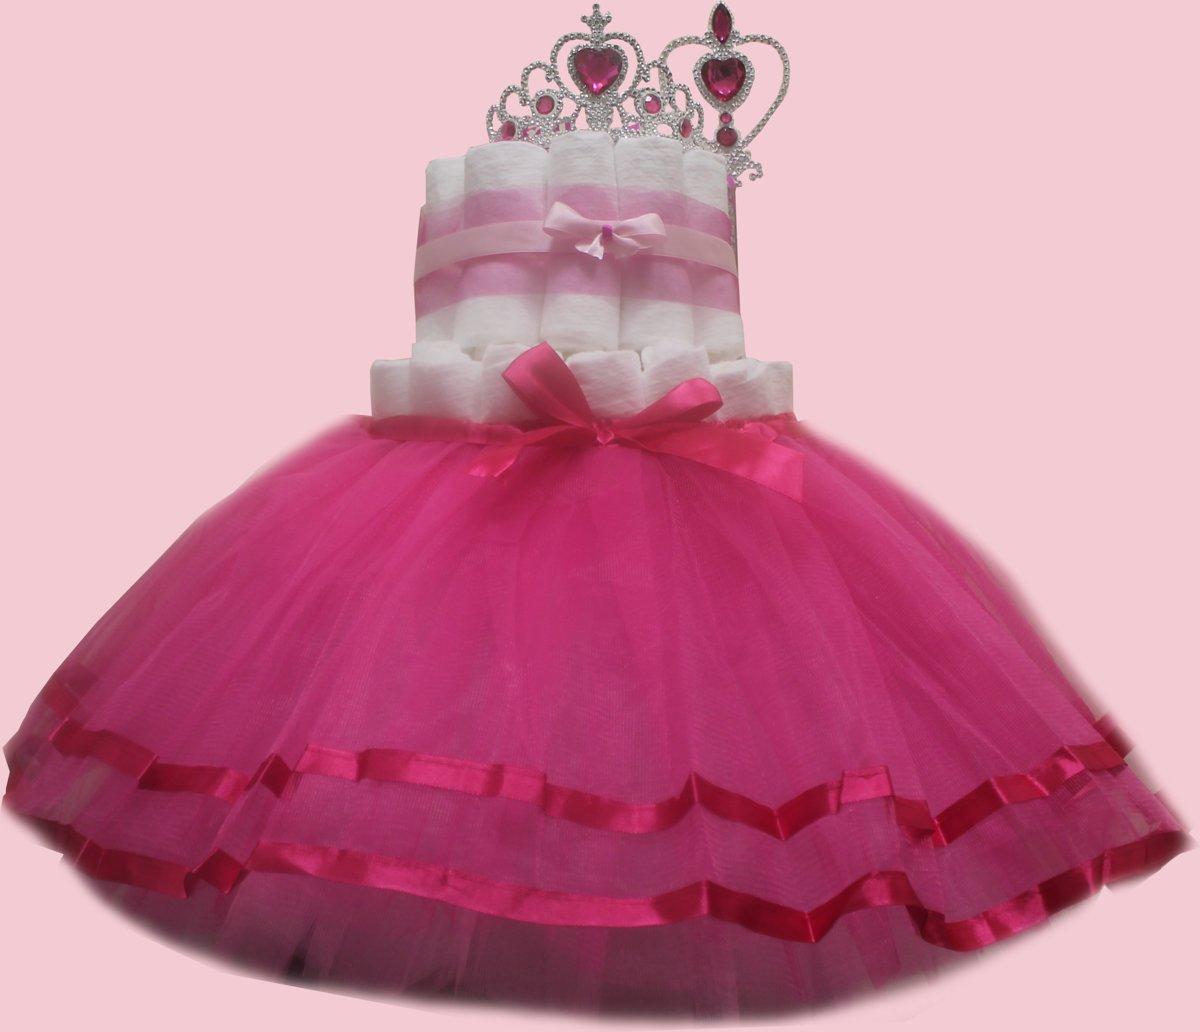 Pampertaart / luiertaart meisjes 2-laags Prinses met rokje maat 1 (2-5 kg) kopen